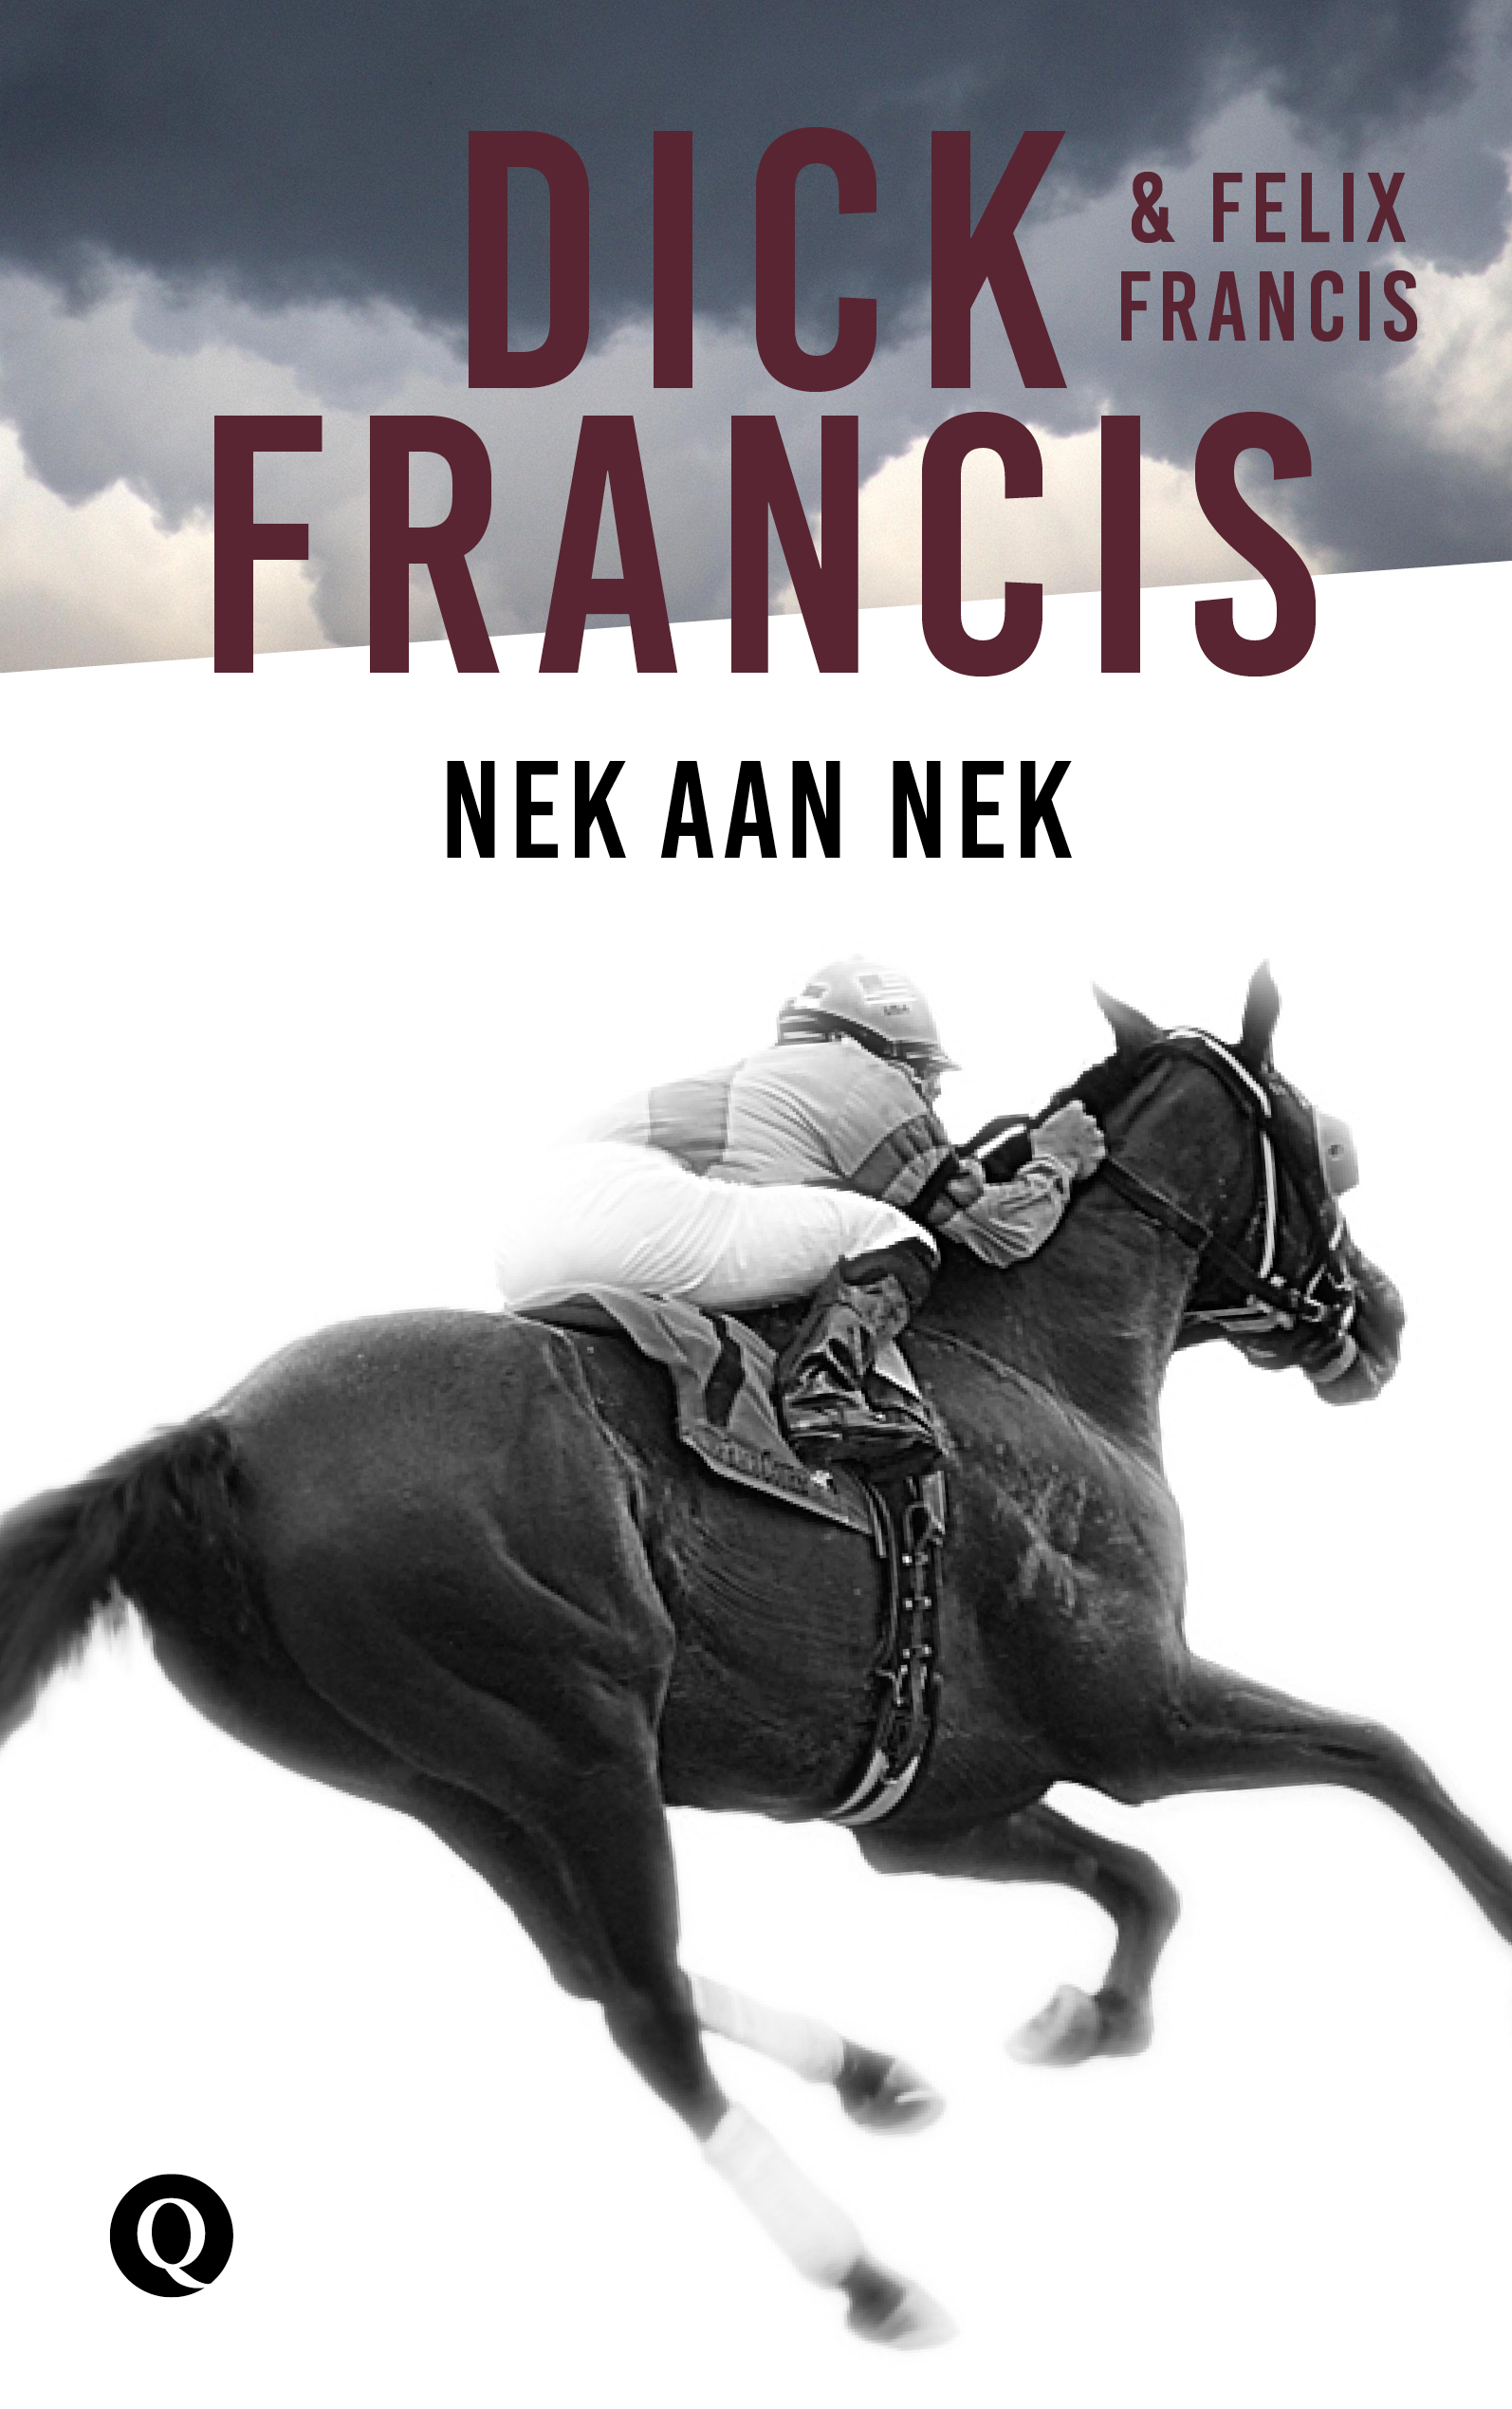 Nek aan nek – Dick Francis & Felix Francis